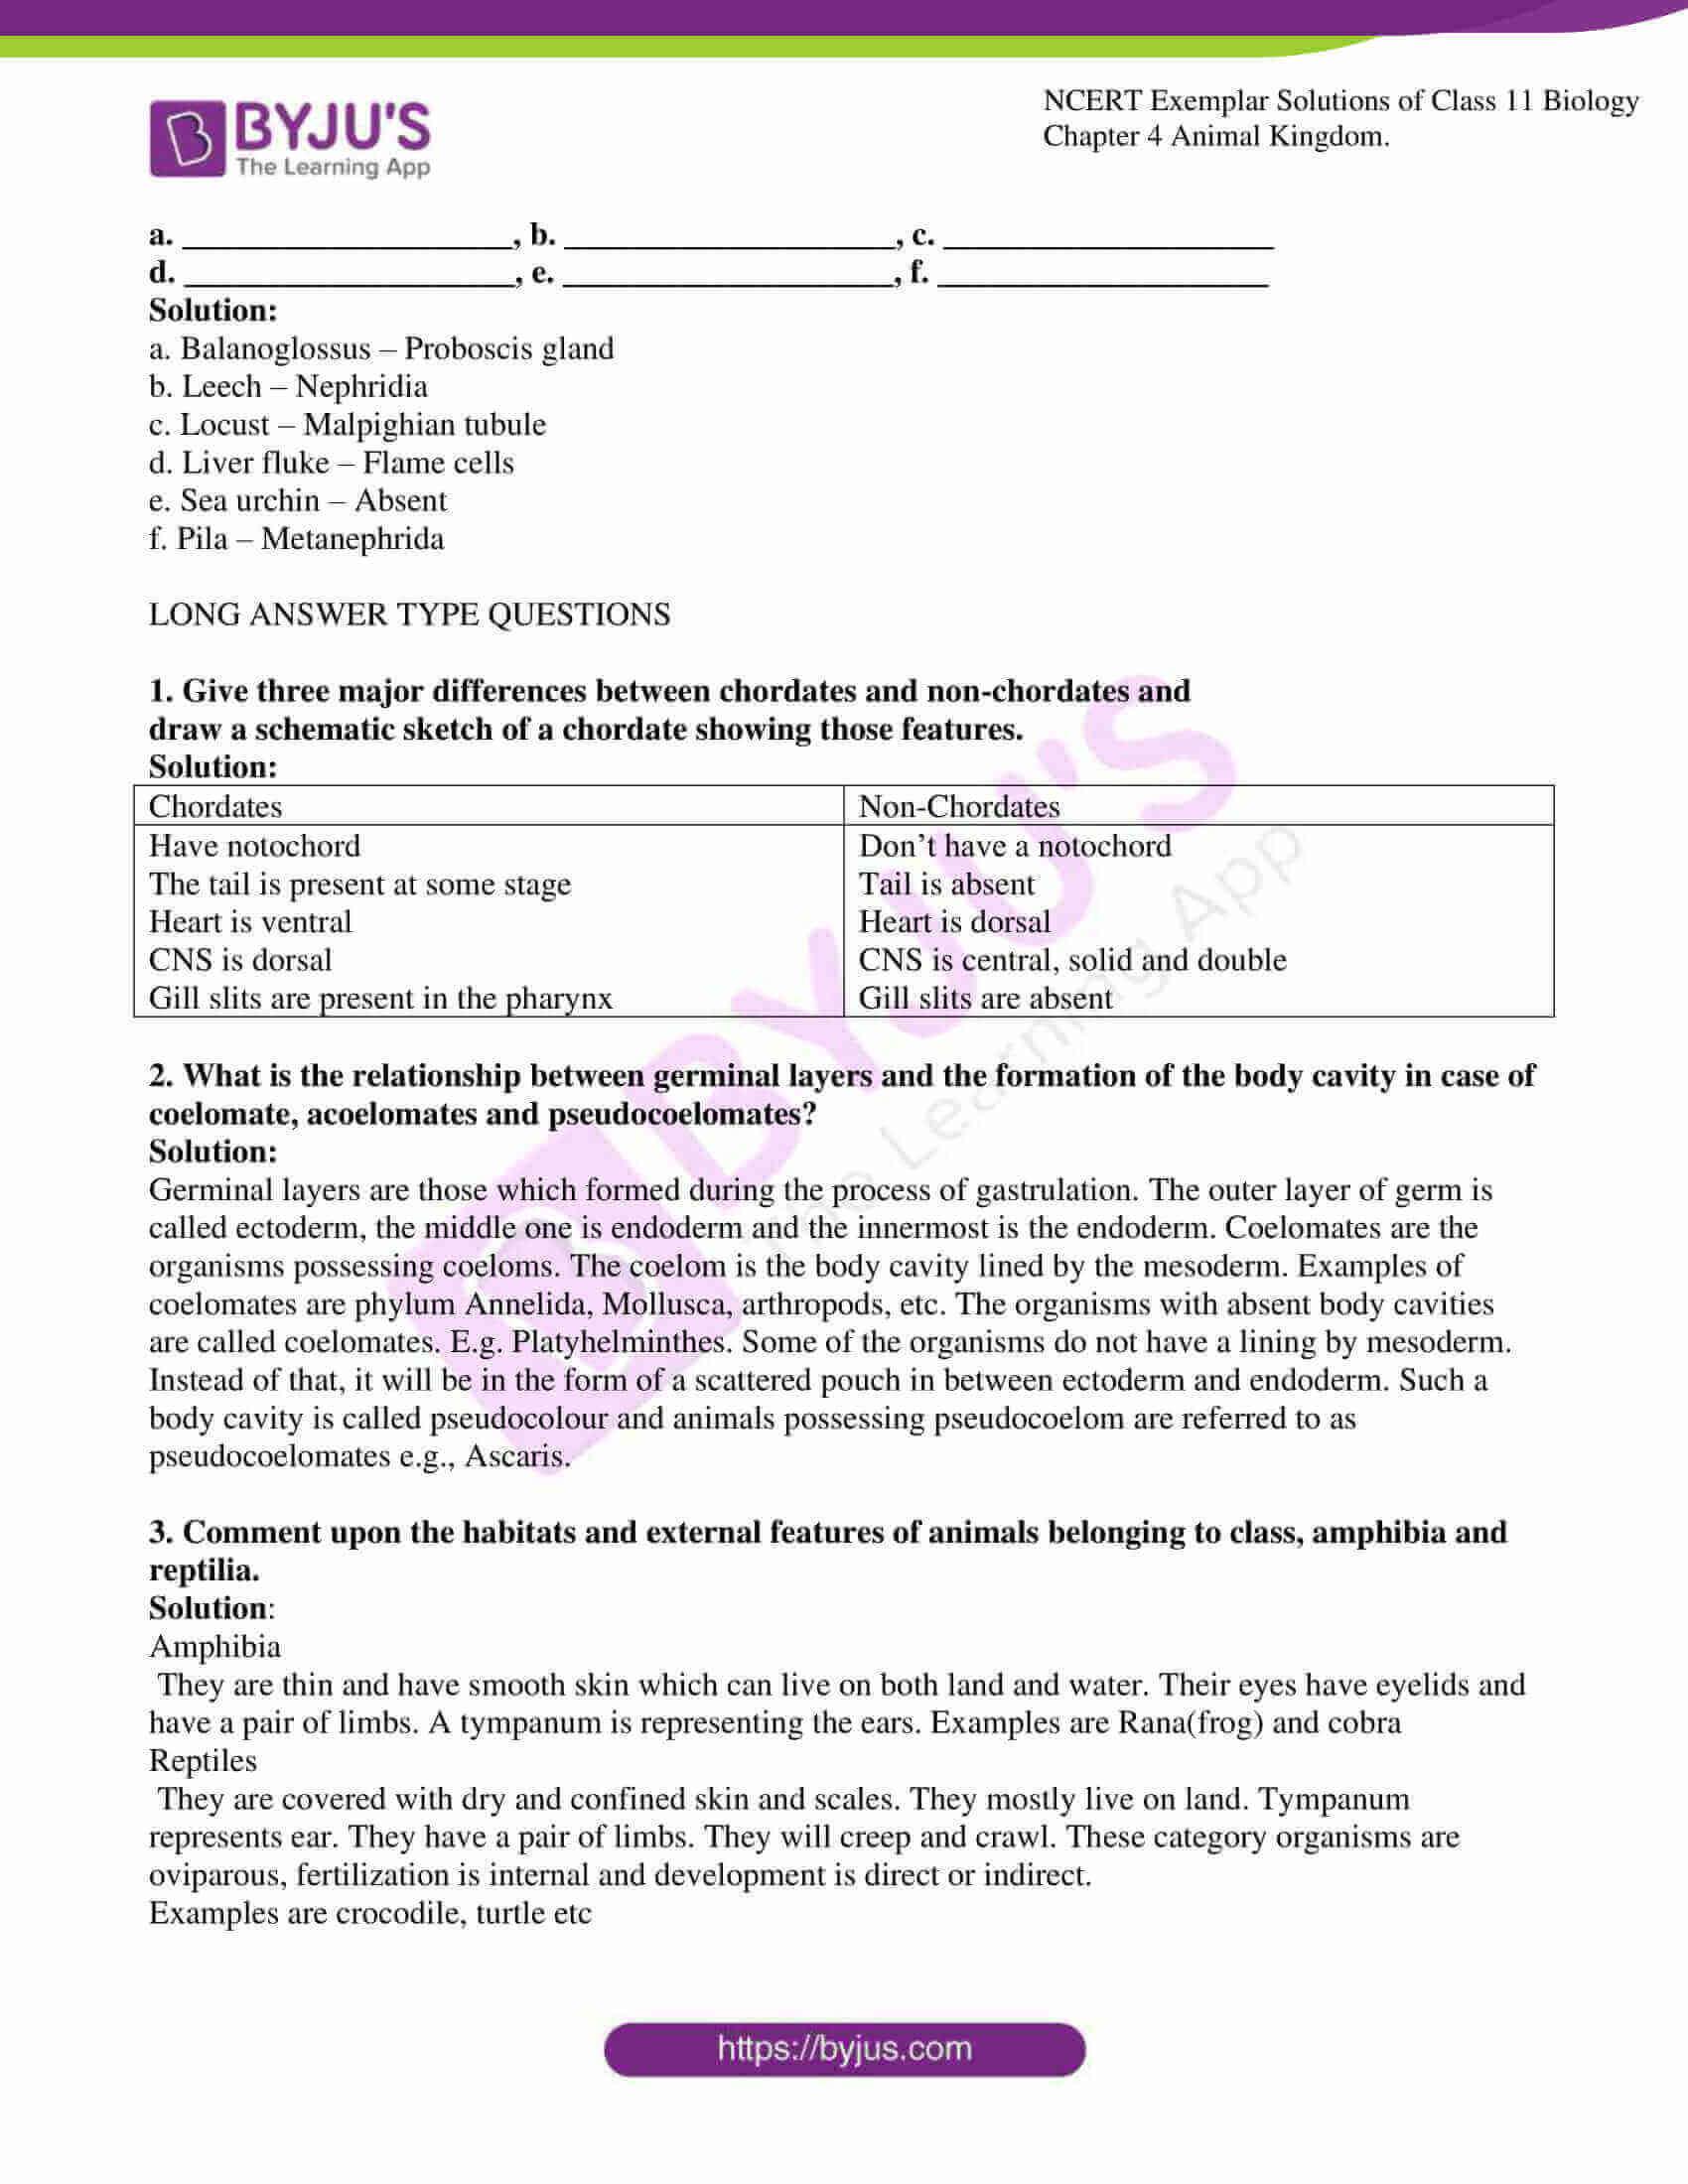 ncert exemplar solutions for class 11 bio chapter 4 10